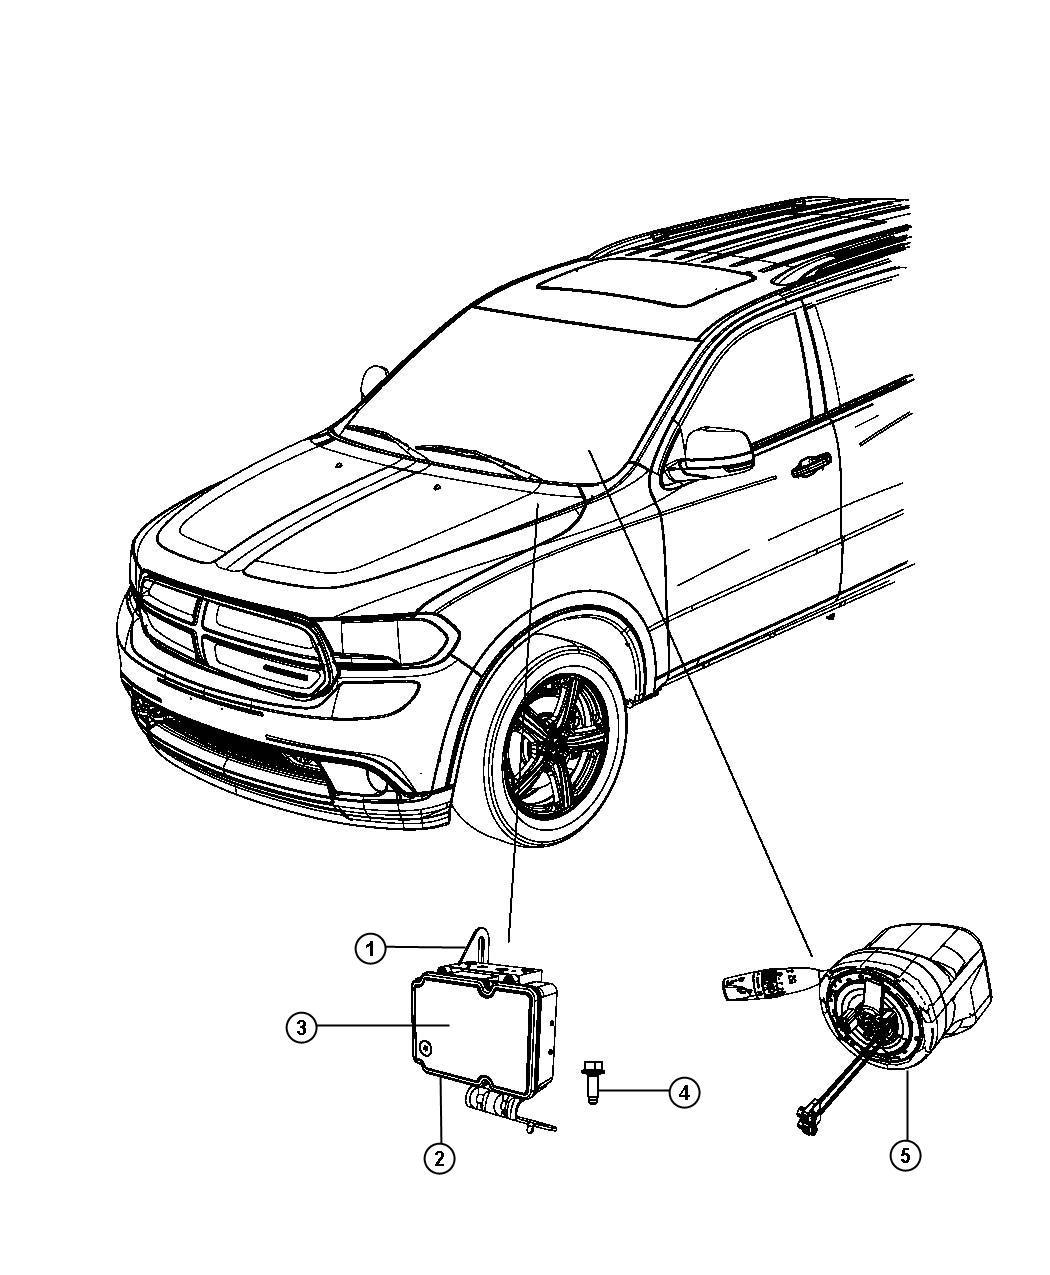 2013 Dodge Durango Module. Anti-lock brake system. Control